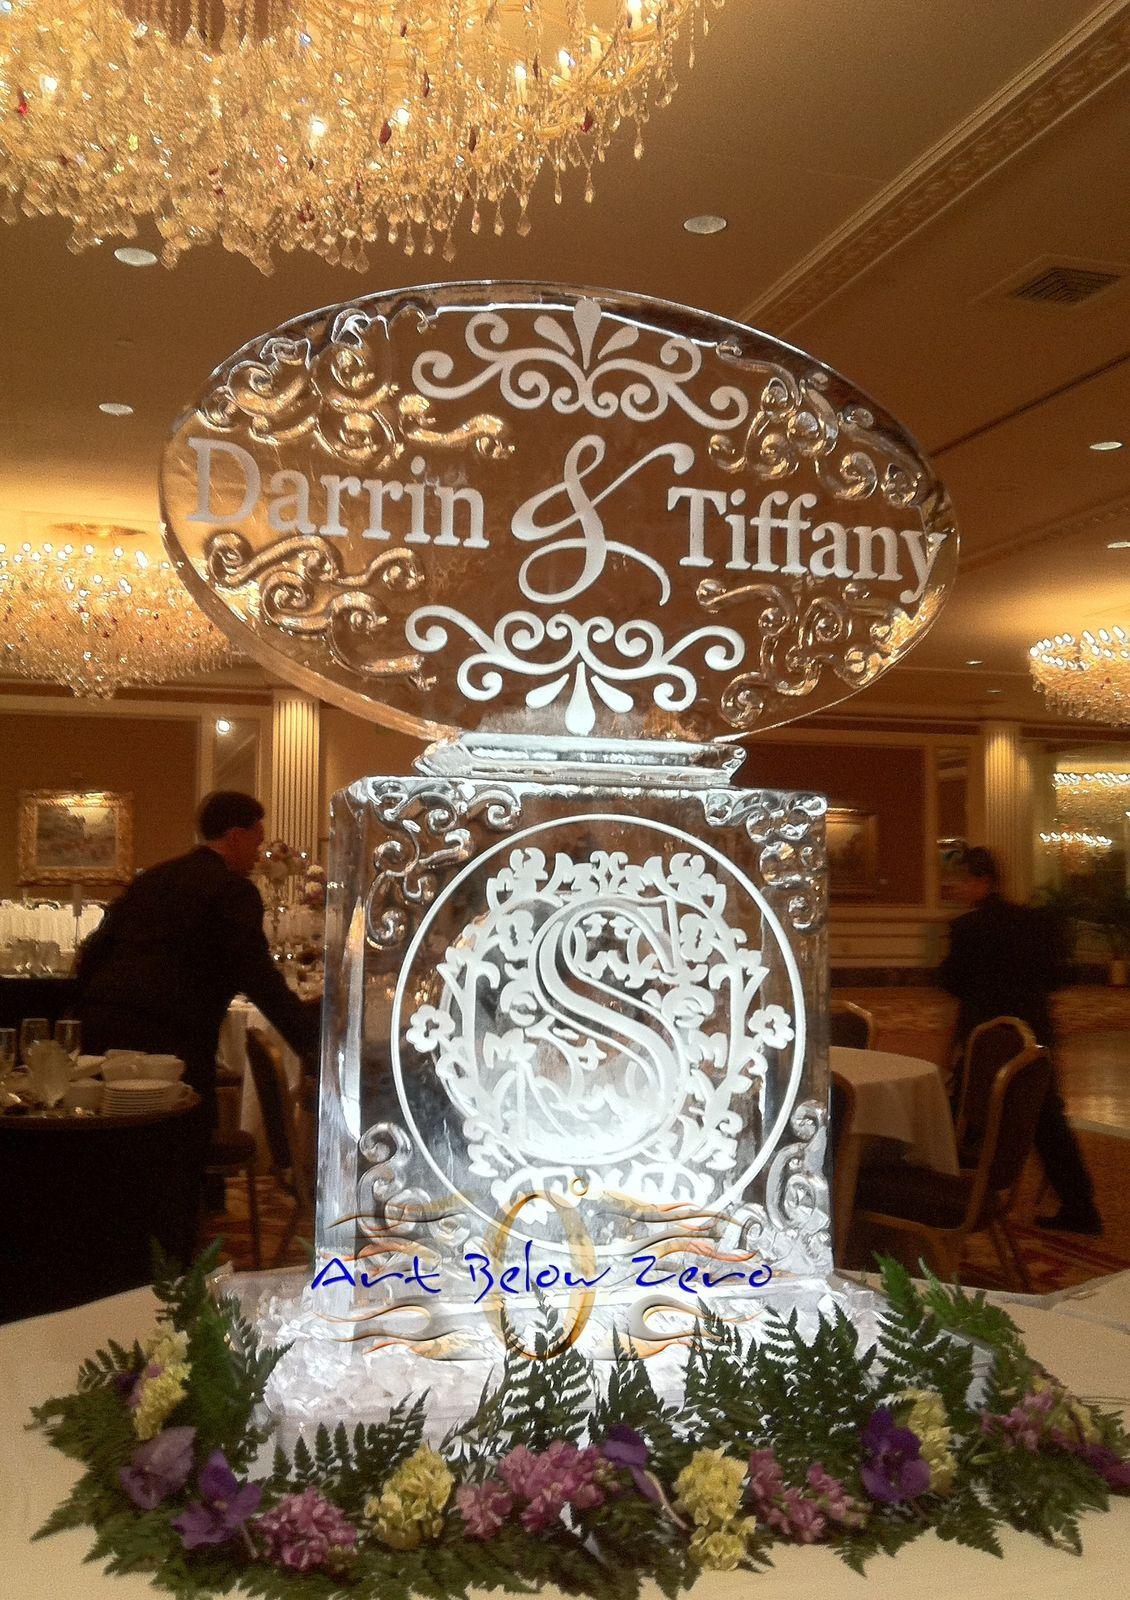 Darrin & Tiffany Monograms wedding ice sculpture | Wedding Ice